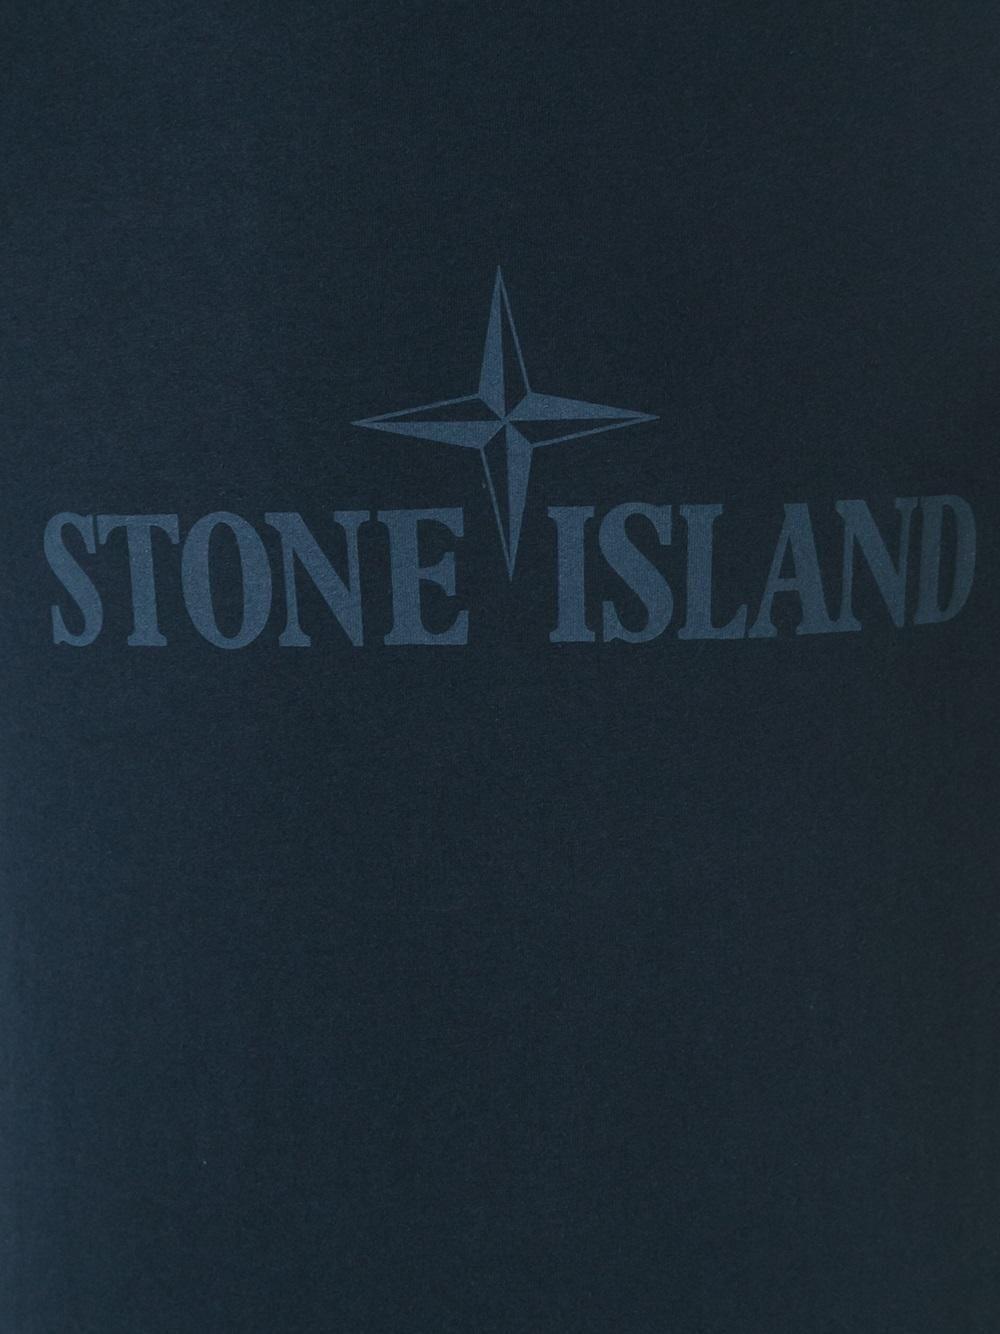 Stone Island Wallpaper 841800 Oboi Dlya Iphone Oboi